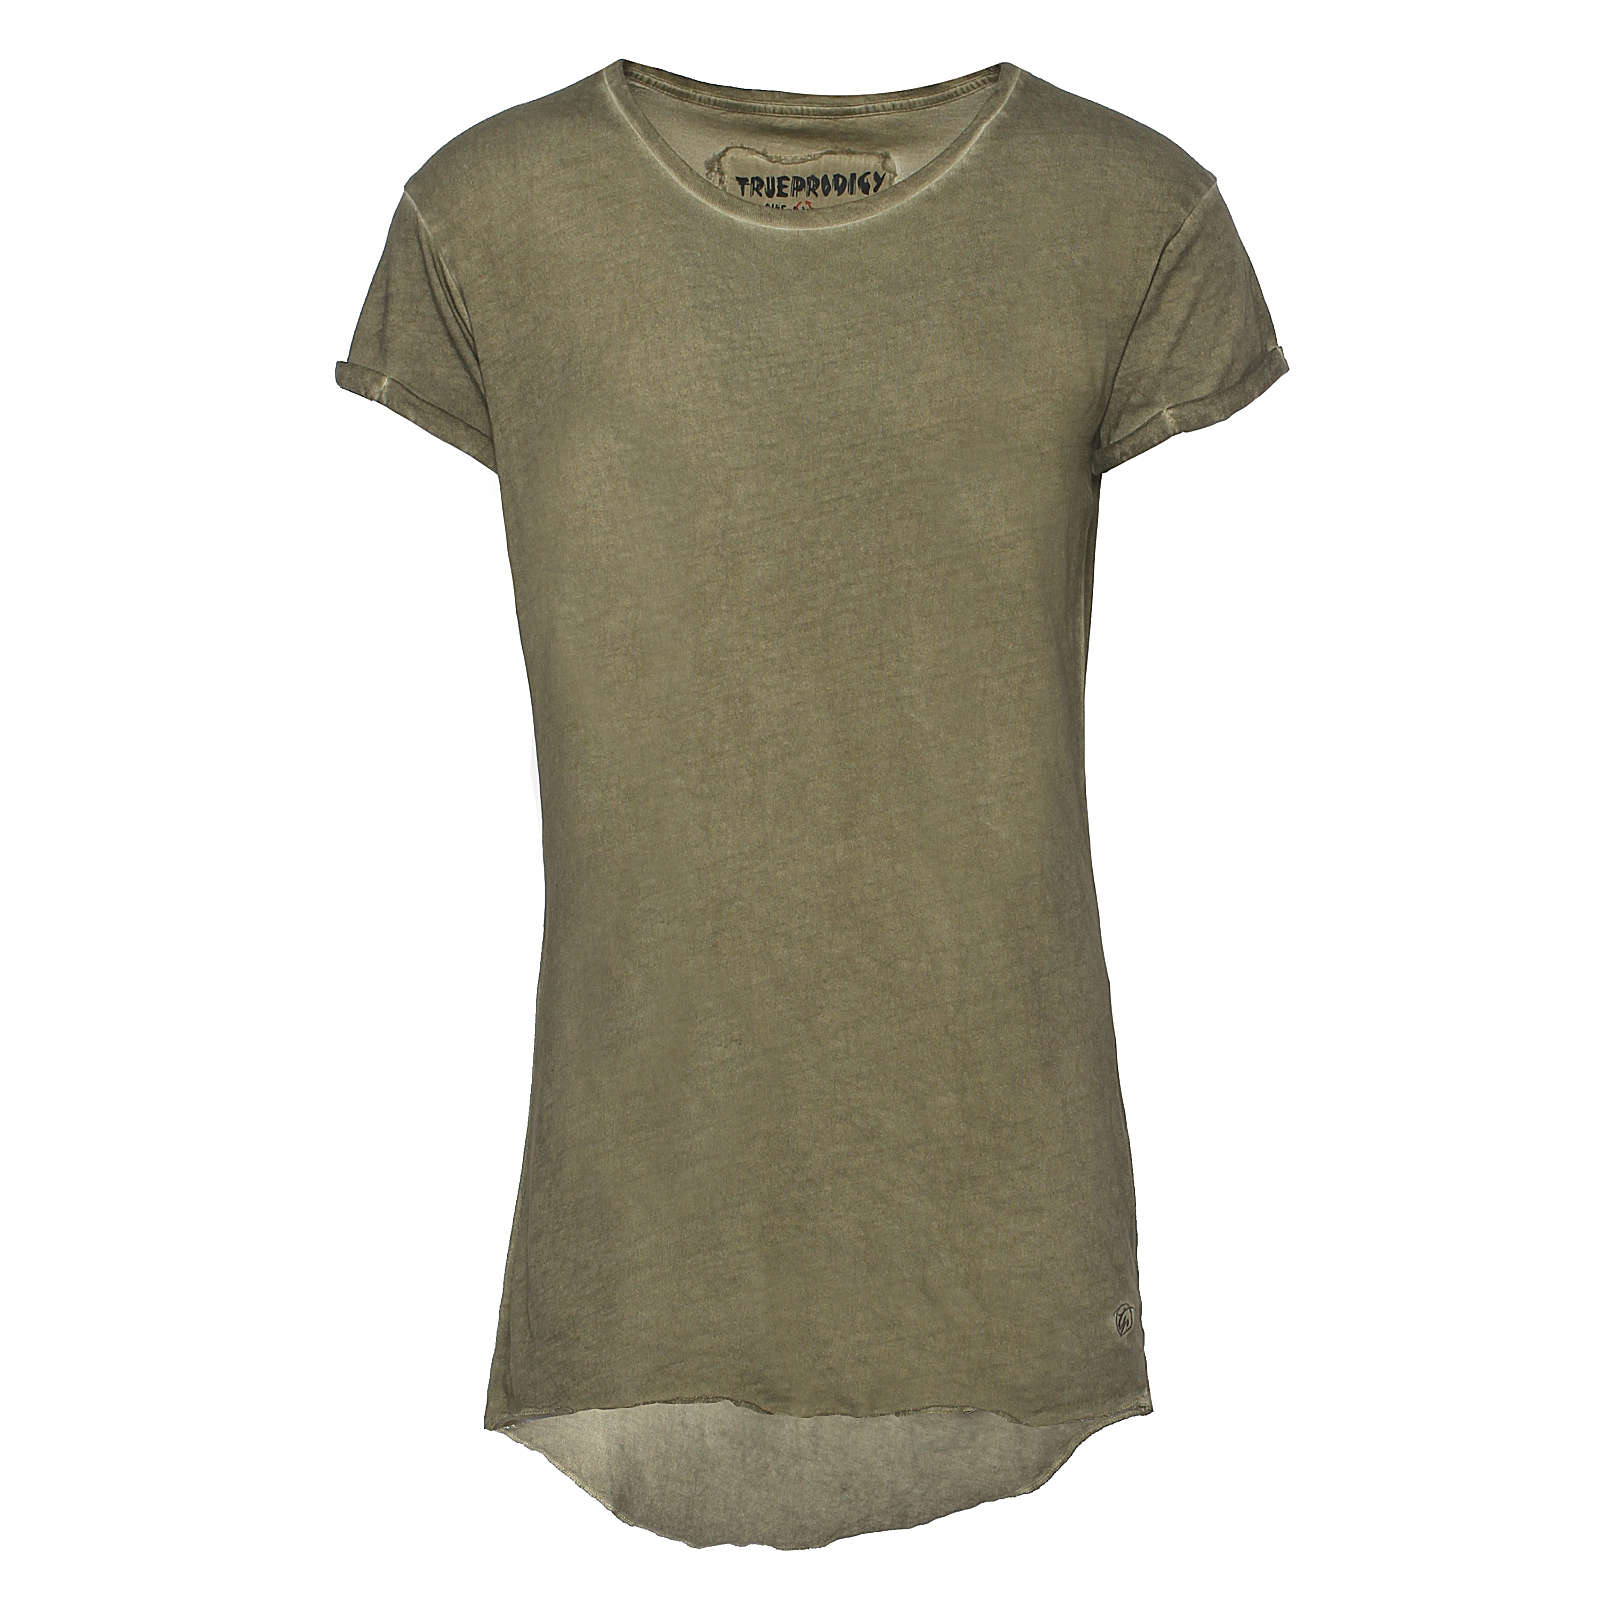 trueprodigy® T-Shirt Basic Summer 1 mit schmalem Schnitt khaki Herren Gr. 54